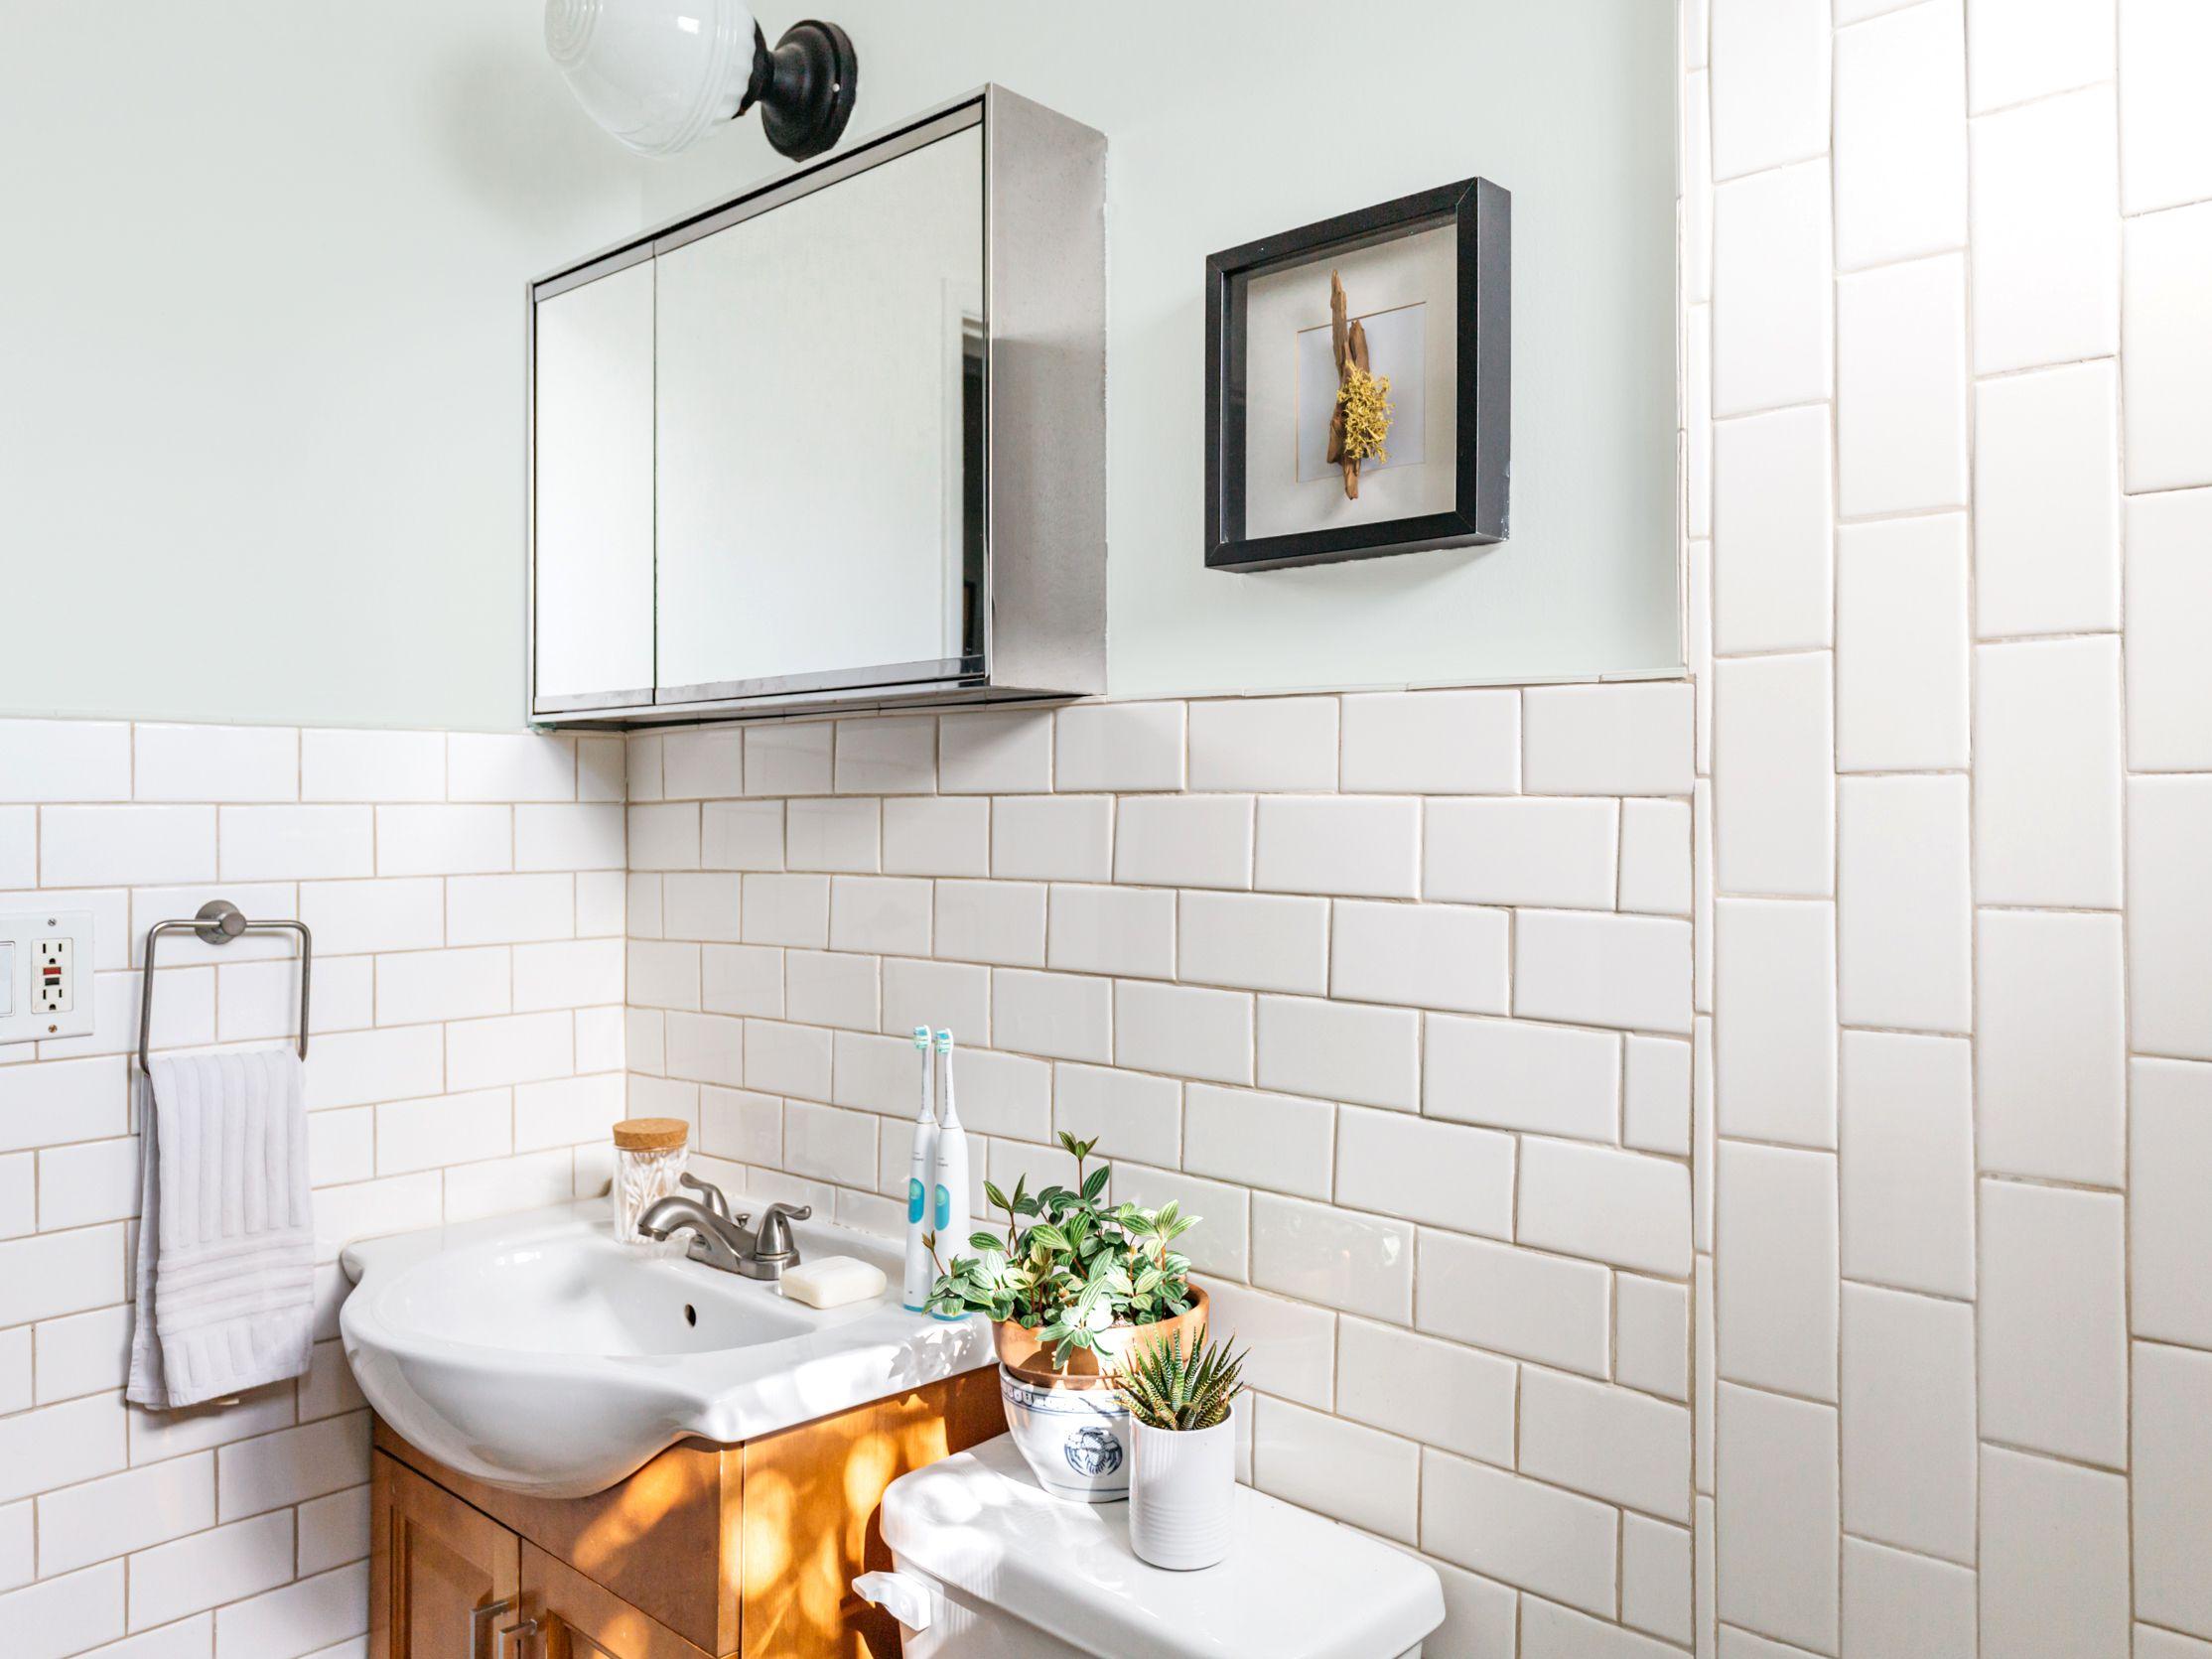 paint color ideas for a small bathroom